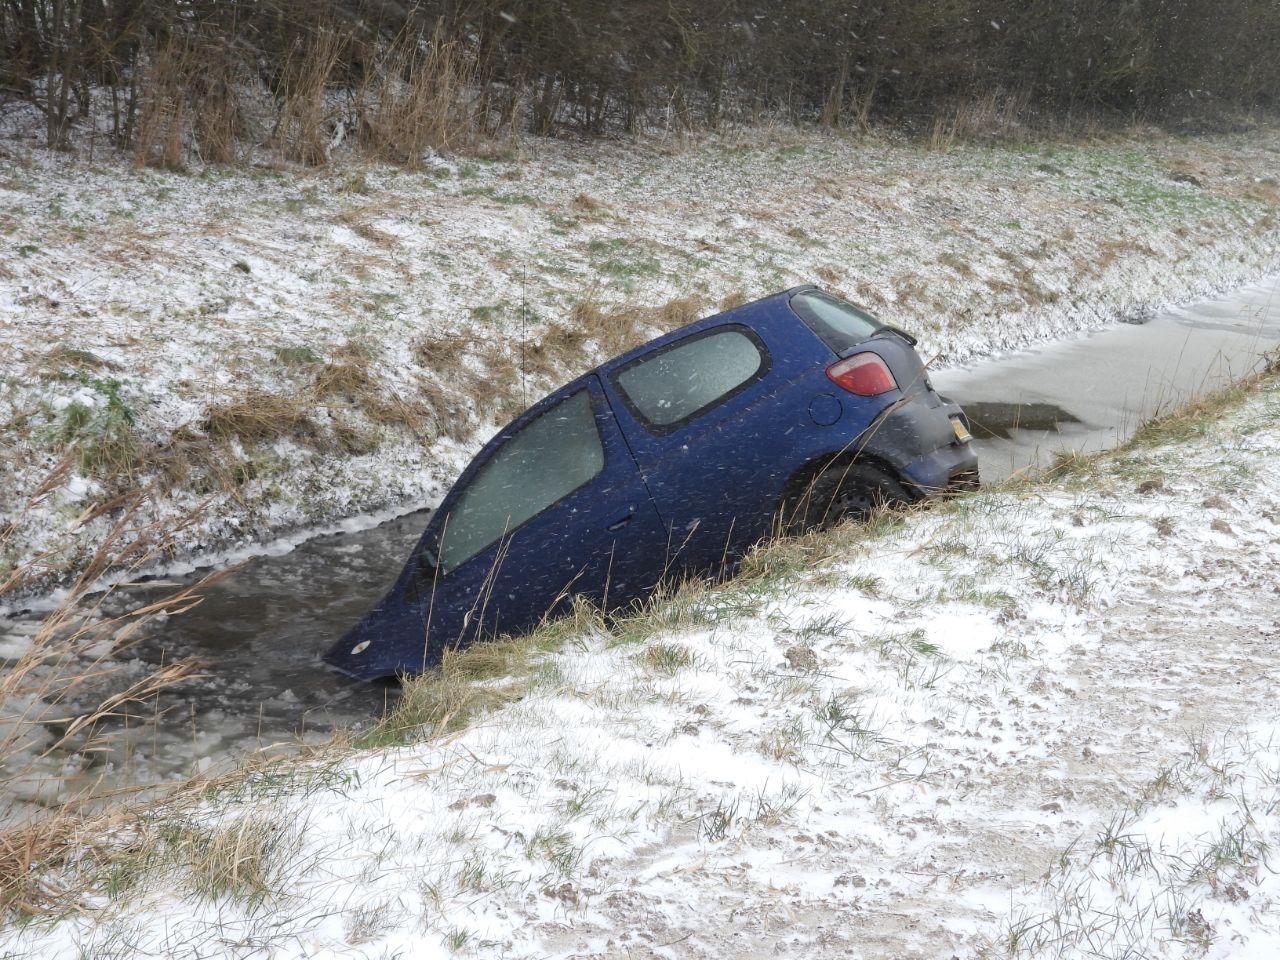 Meerdere auto's belande in de sloot na Sneeuwval en gladheid in Friesland